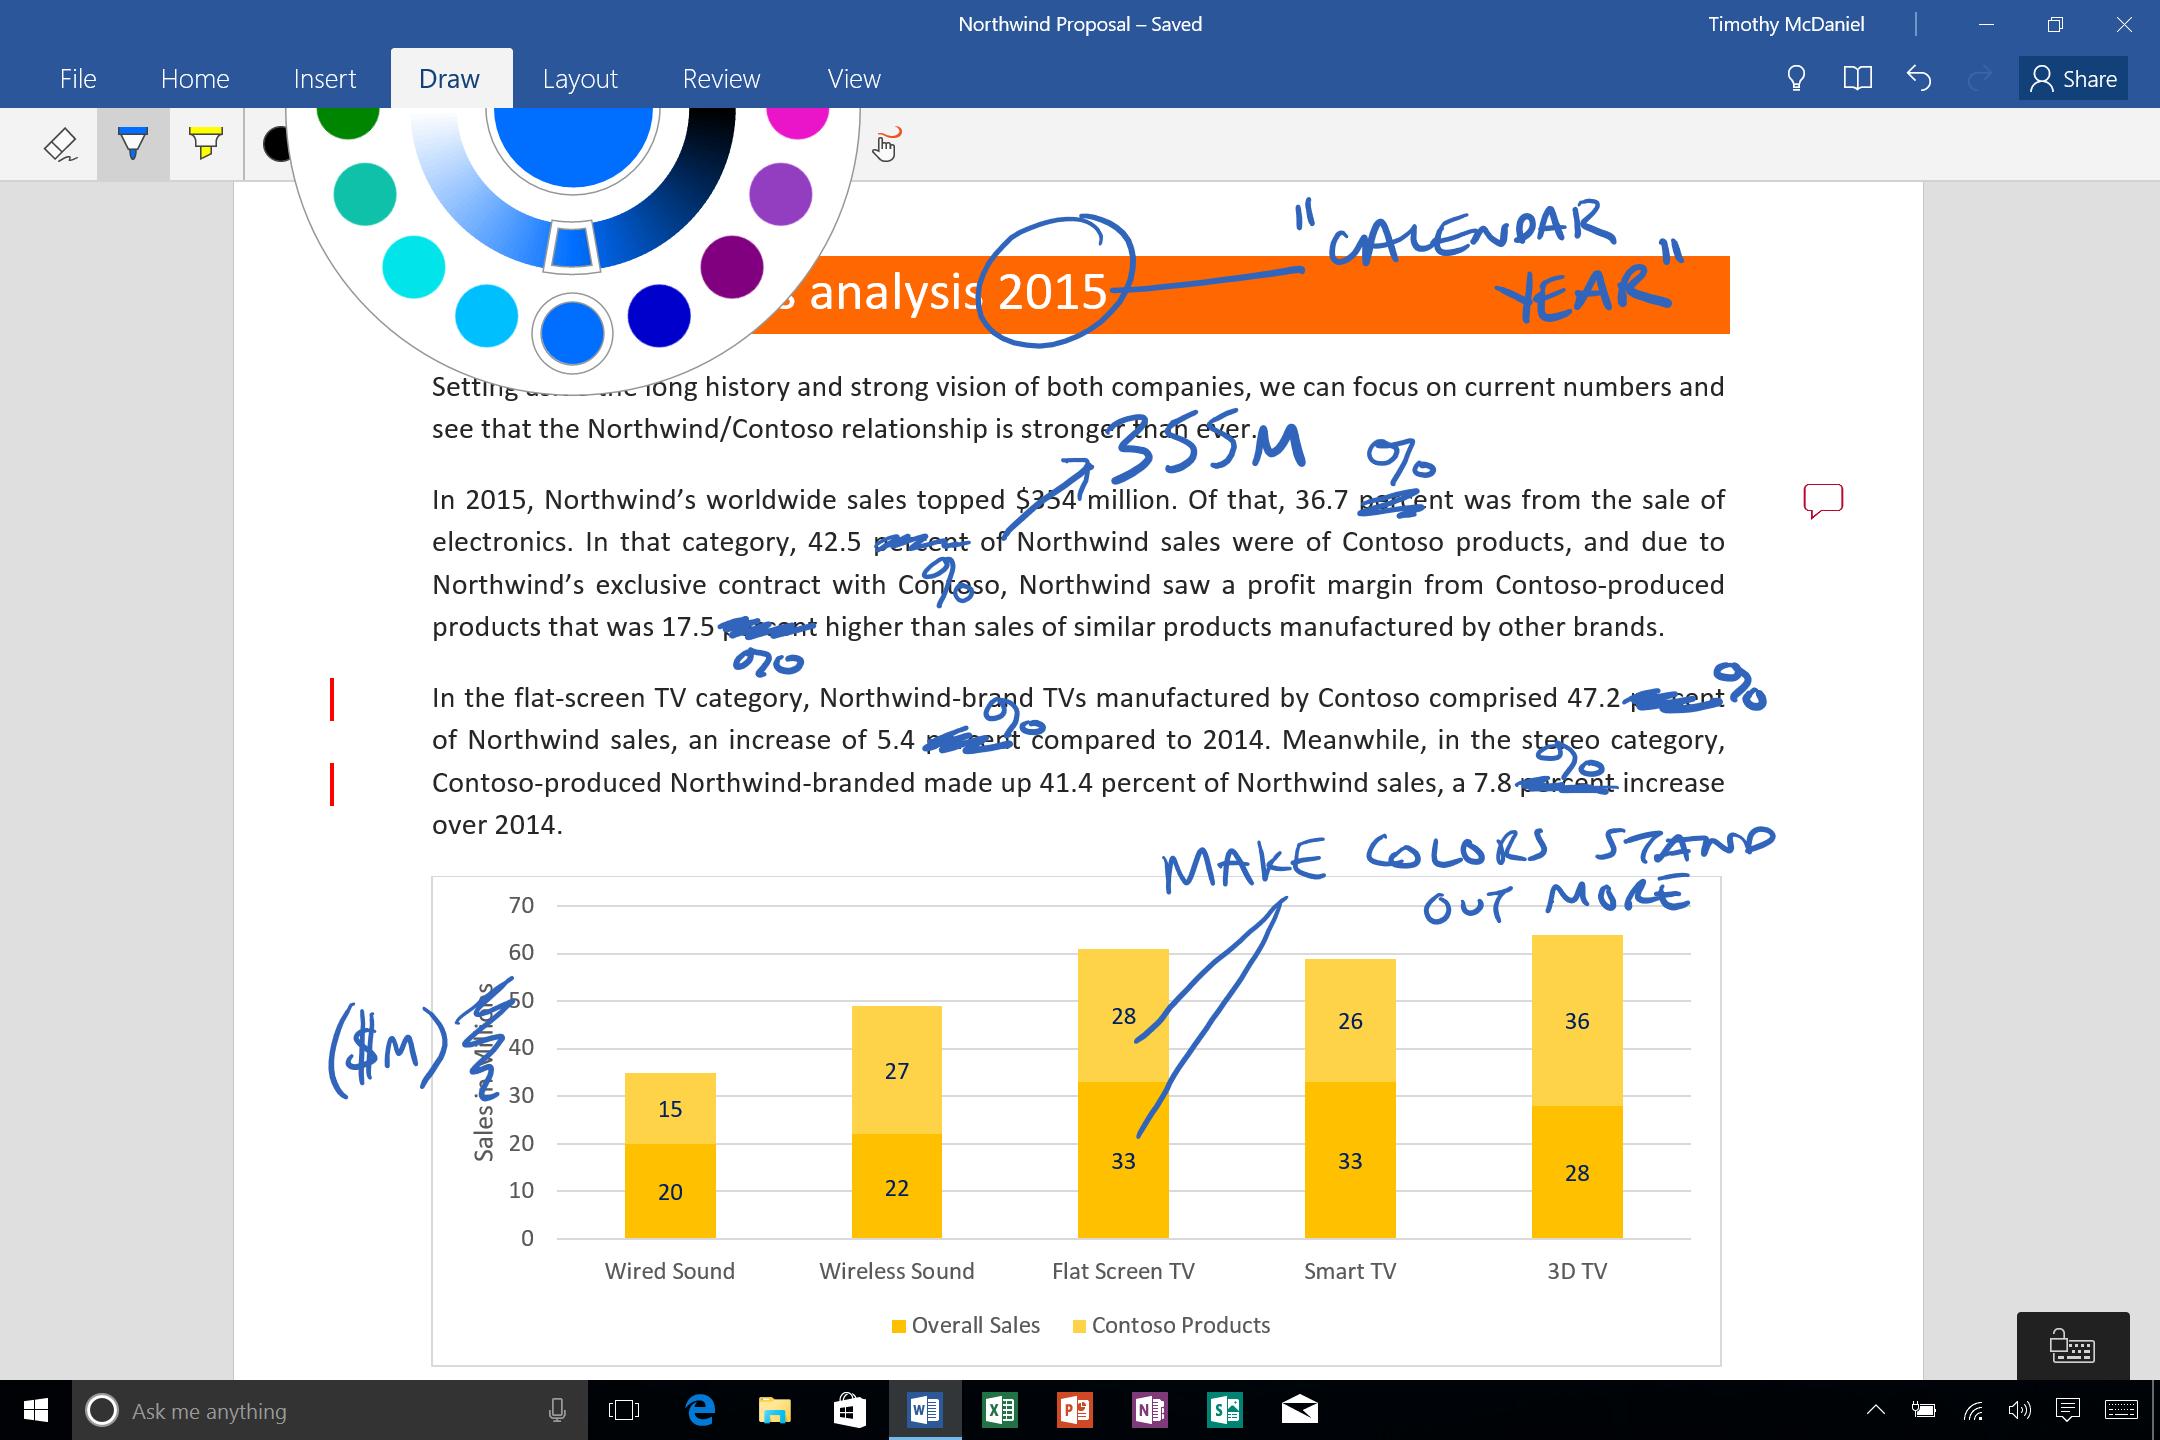 February Office 365 updates - Microsoft 365 Blog